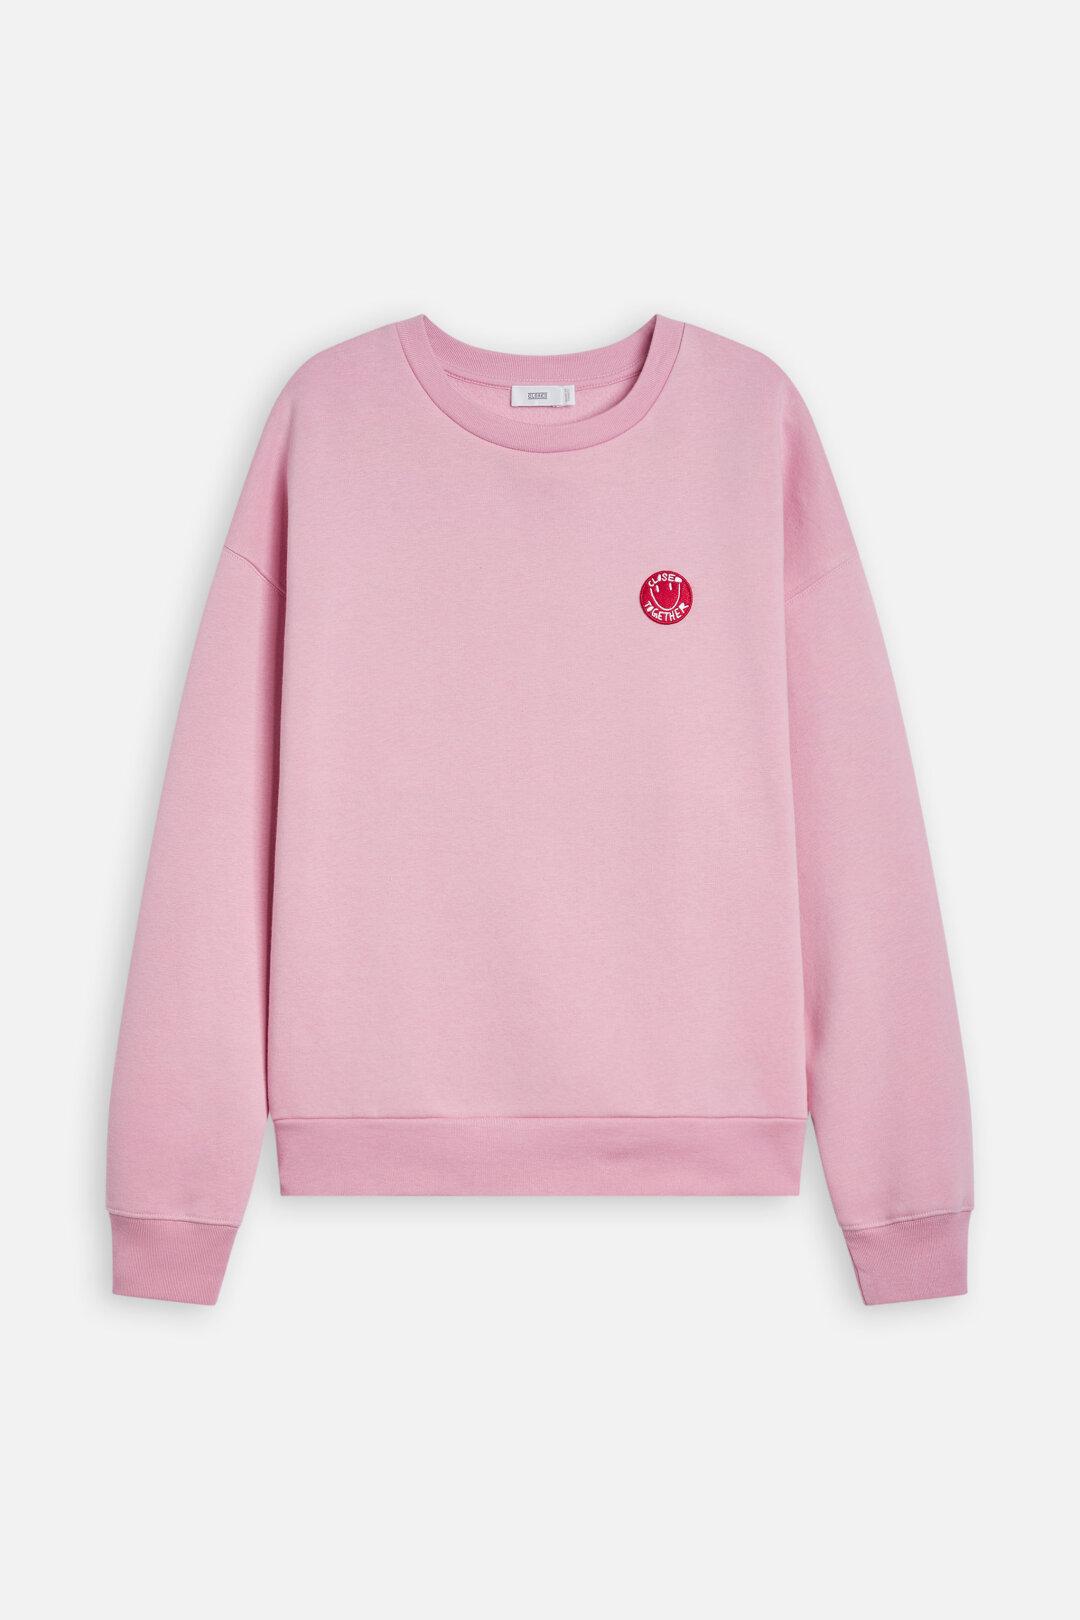 Sweatshirt, closed together, CLOSED